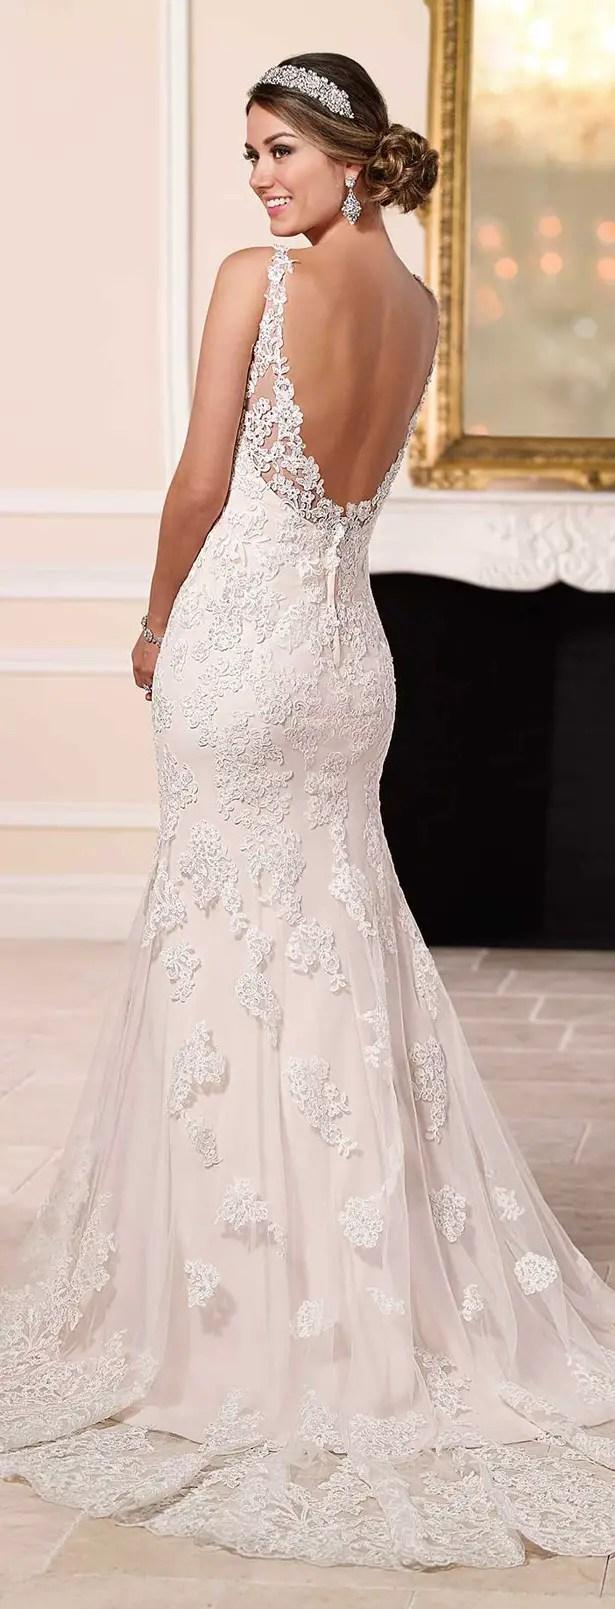 stella york spring wedding dresses wedding gowns Wedding Dress by Stella York Spring